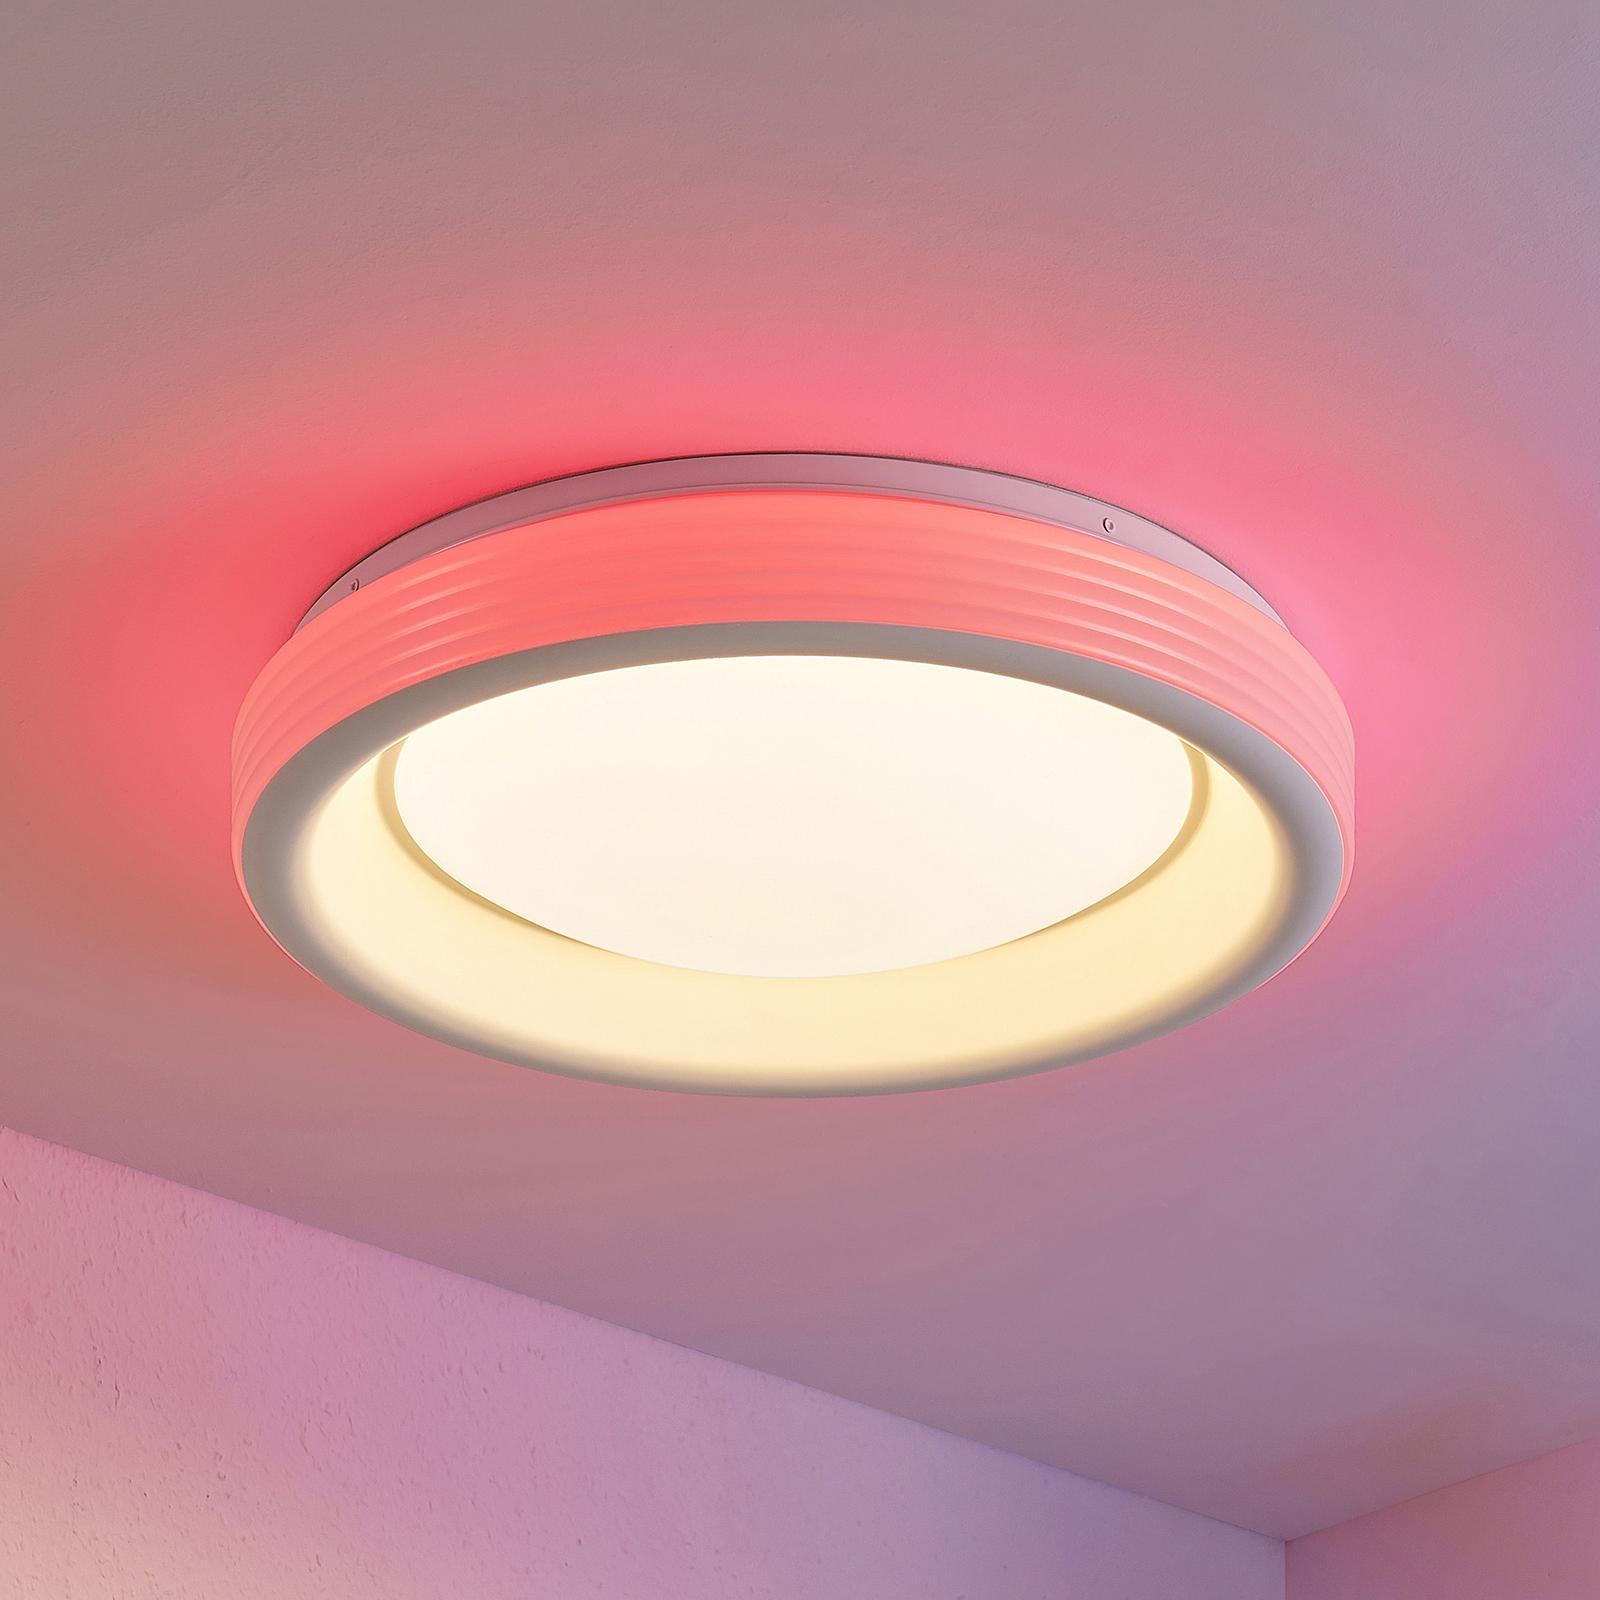 Lindby Inarum LED-taklampe, RGB, CCT, dimbar